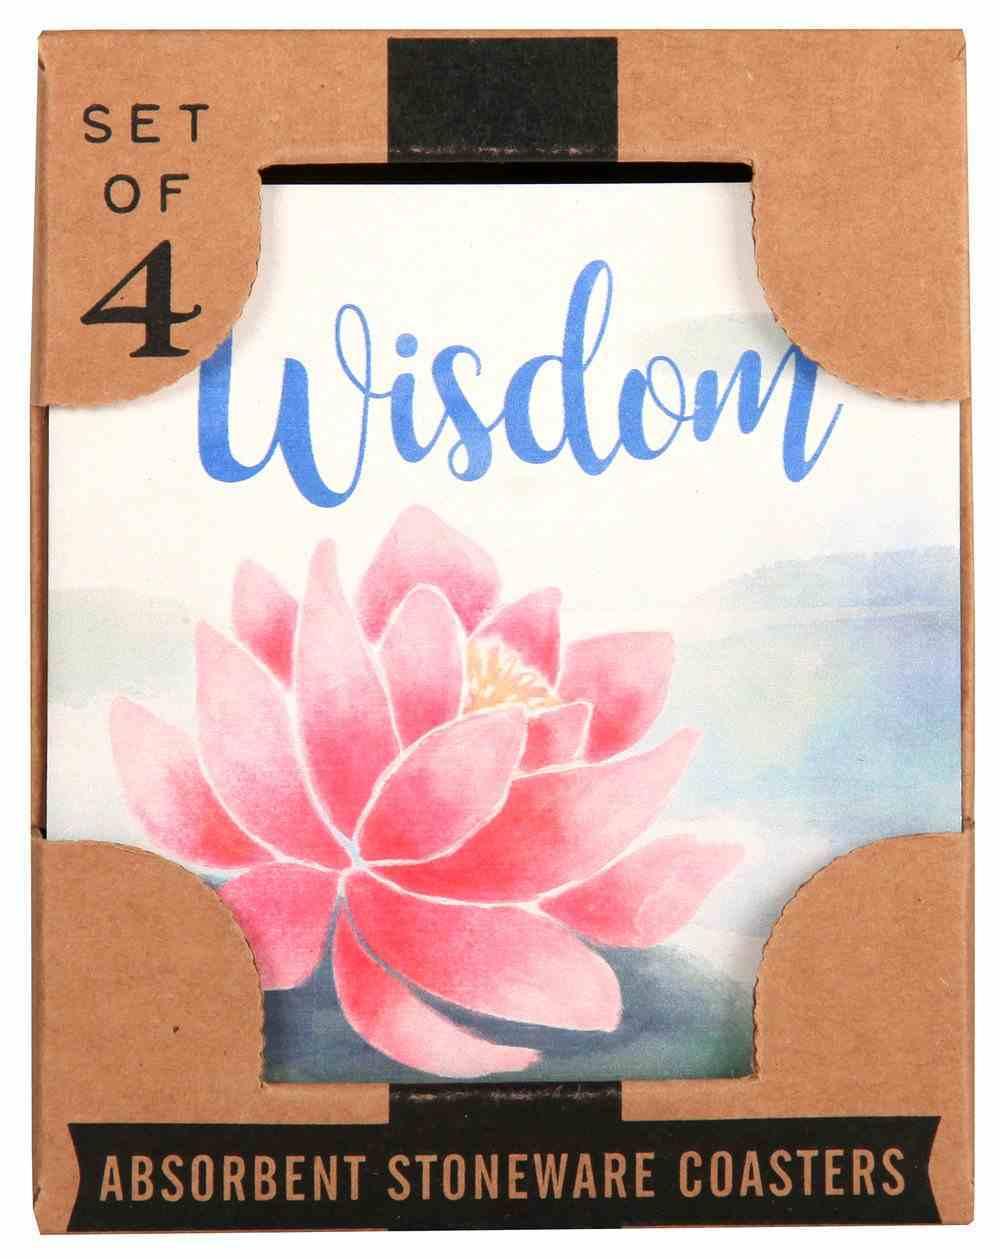 Ceramic Square House Coaster Set of 4: Serenity Prayer/Pale Floral Homeware